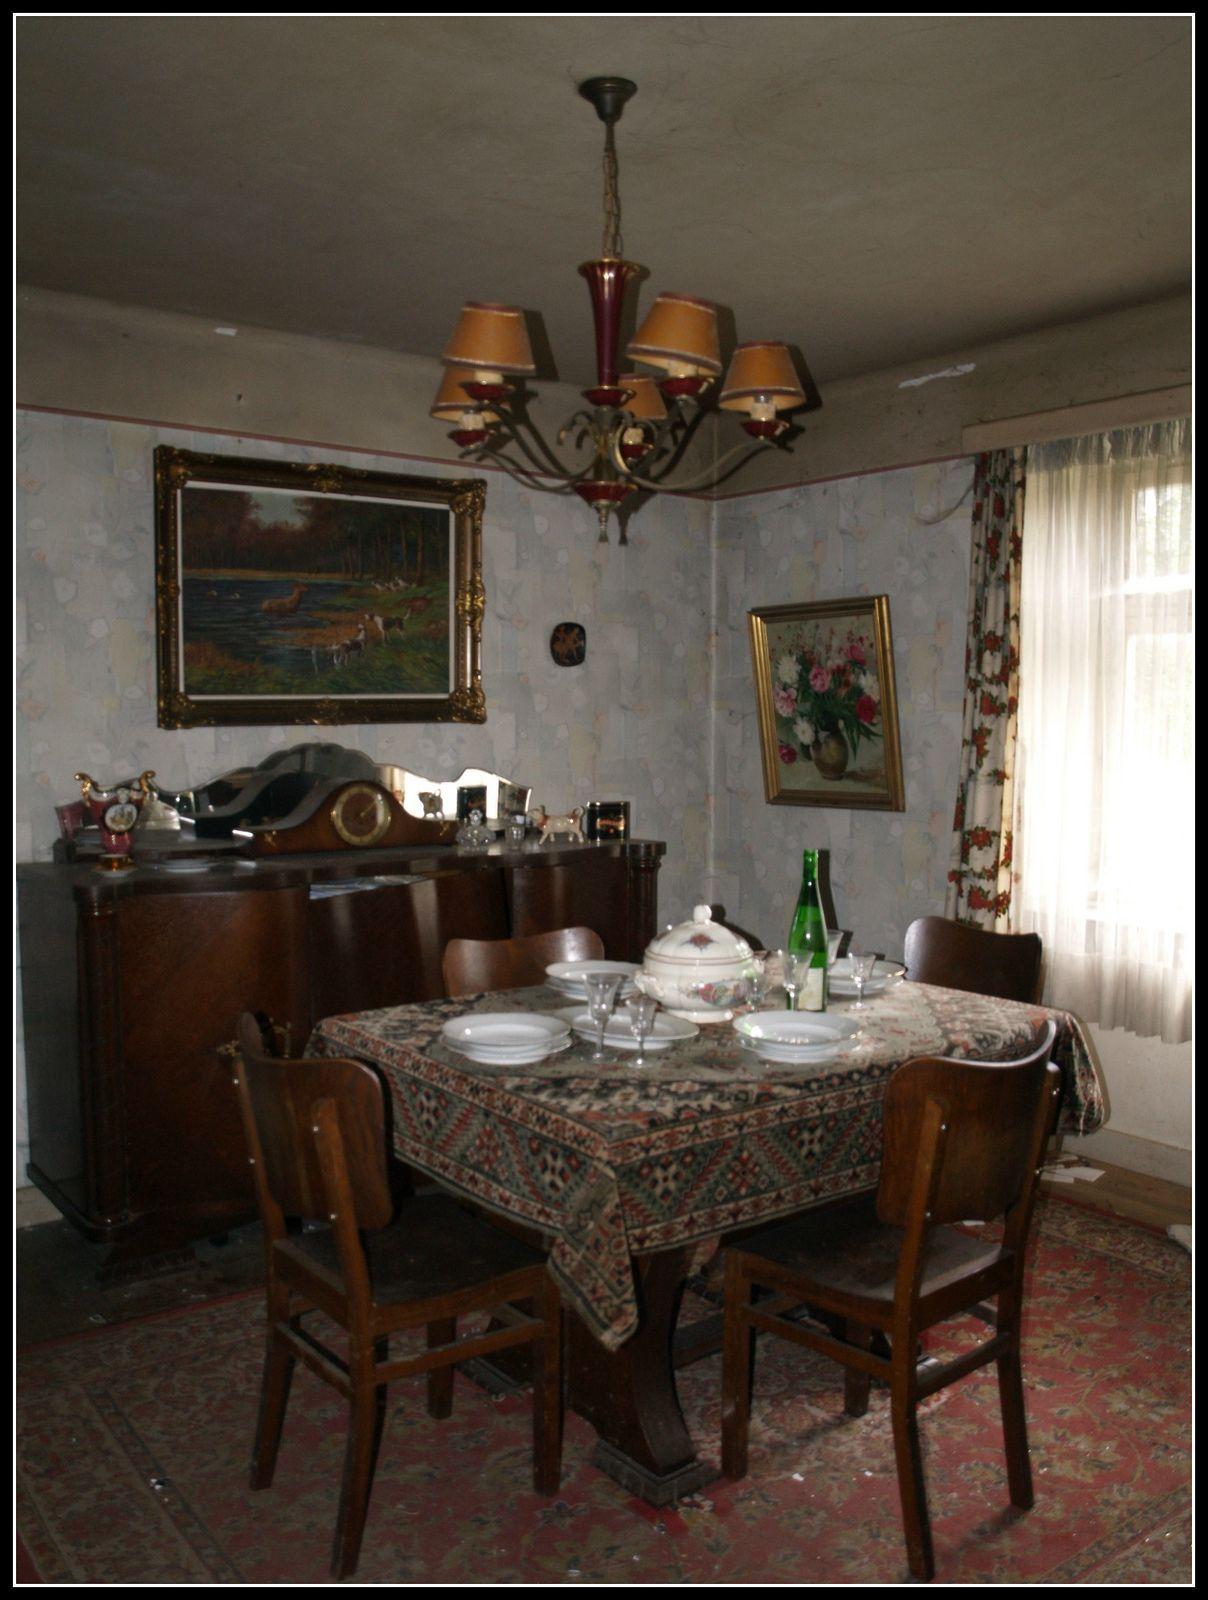 Sala da pranzo | Abandoned houses, Home decor, Dining table